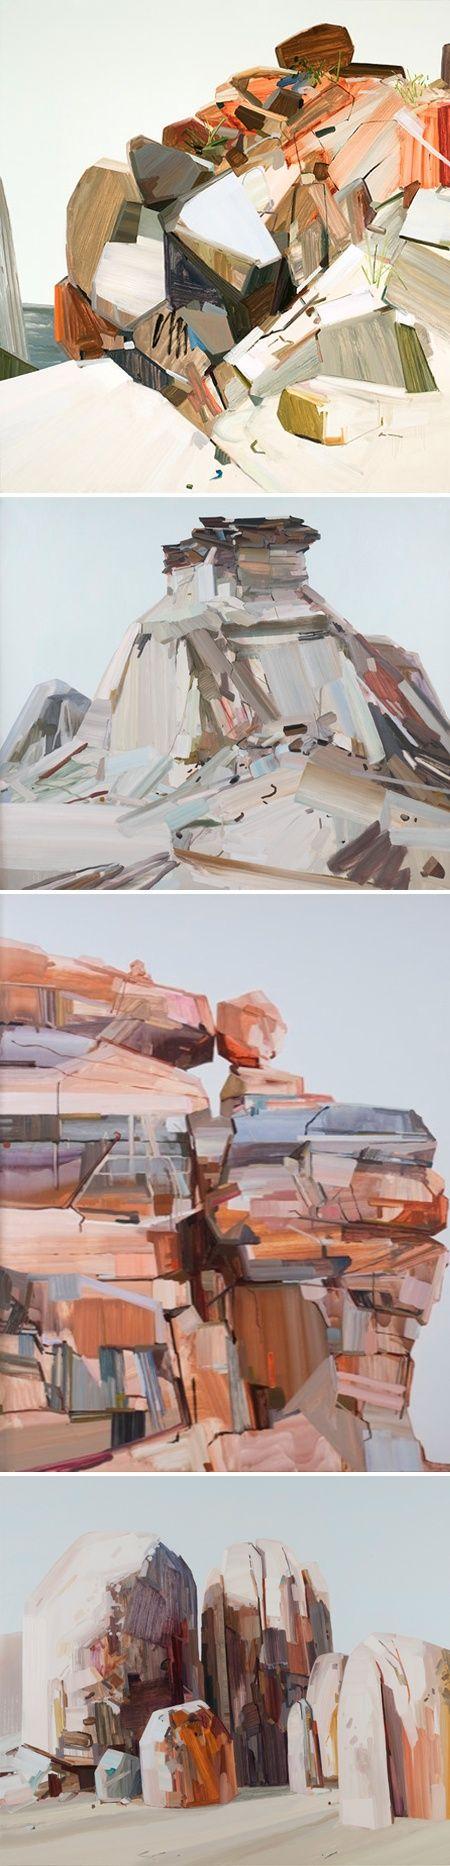 abstract painting #www.metropolisla.com viktoria mogyoro